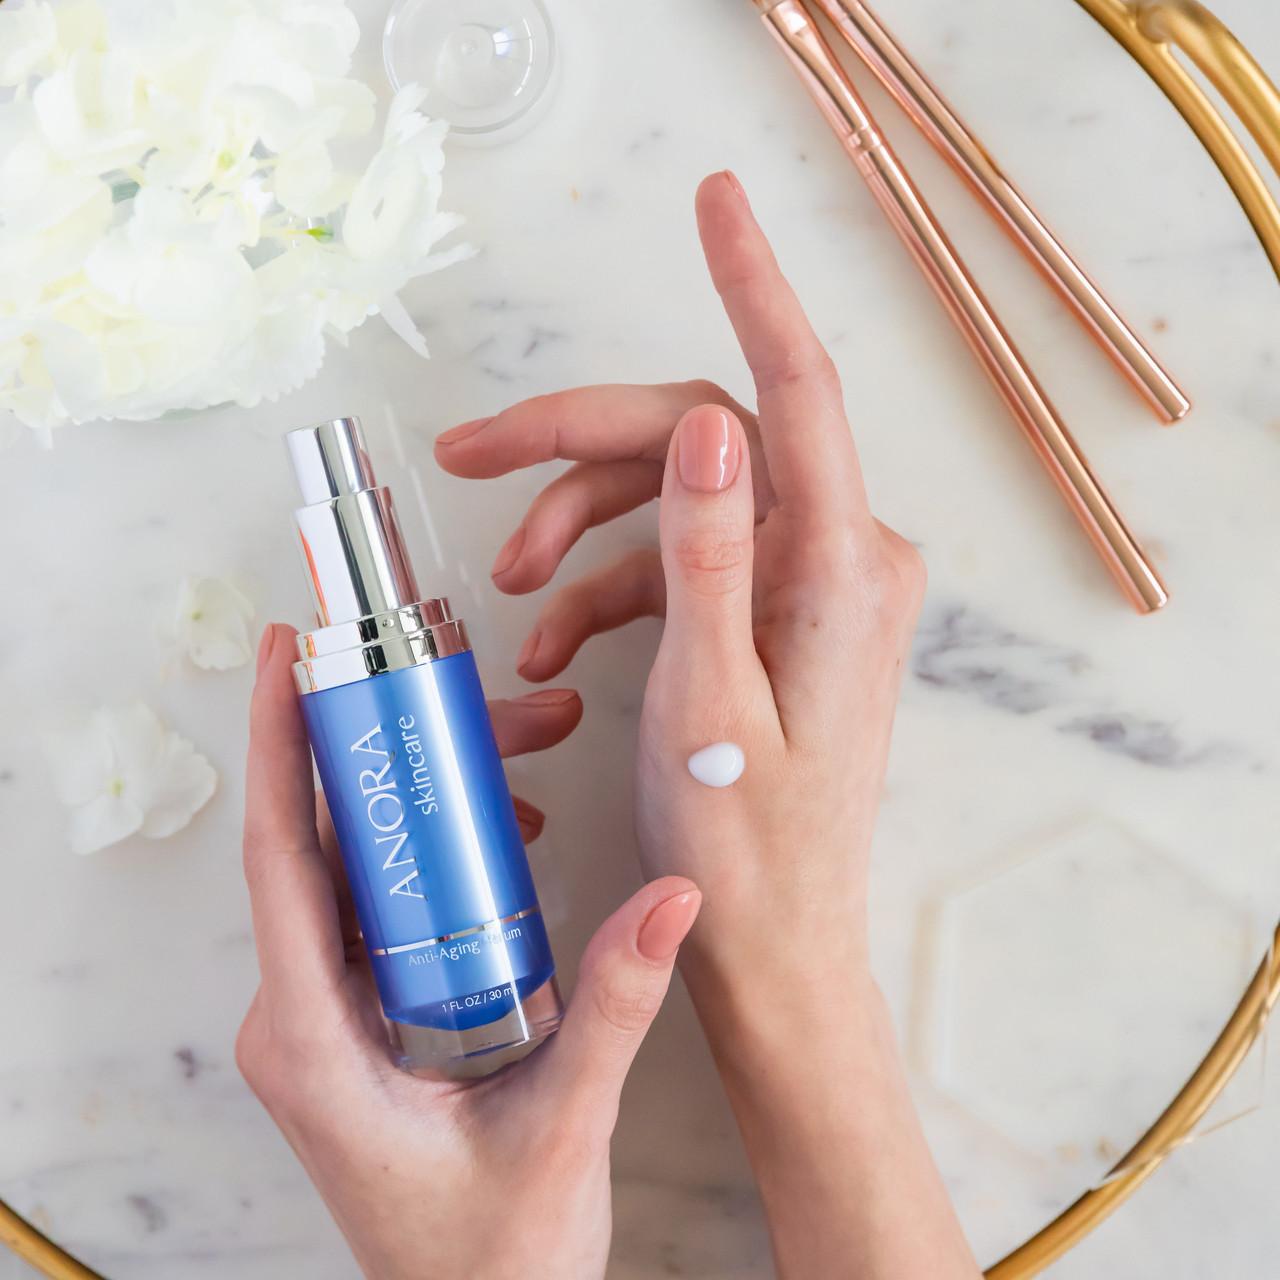 Anora Skincare Anti-Aging Serum - Front